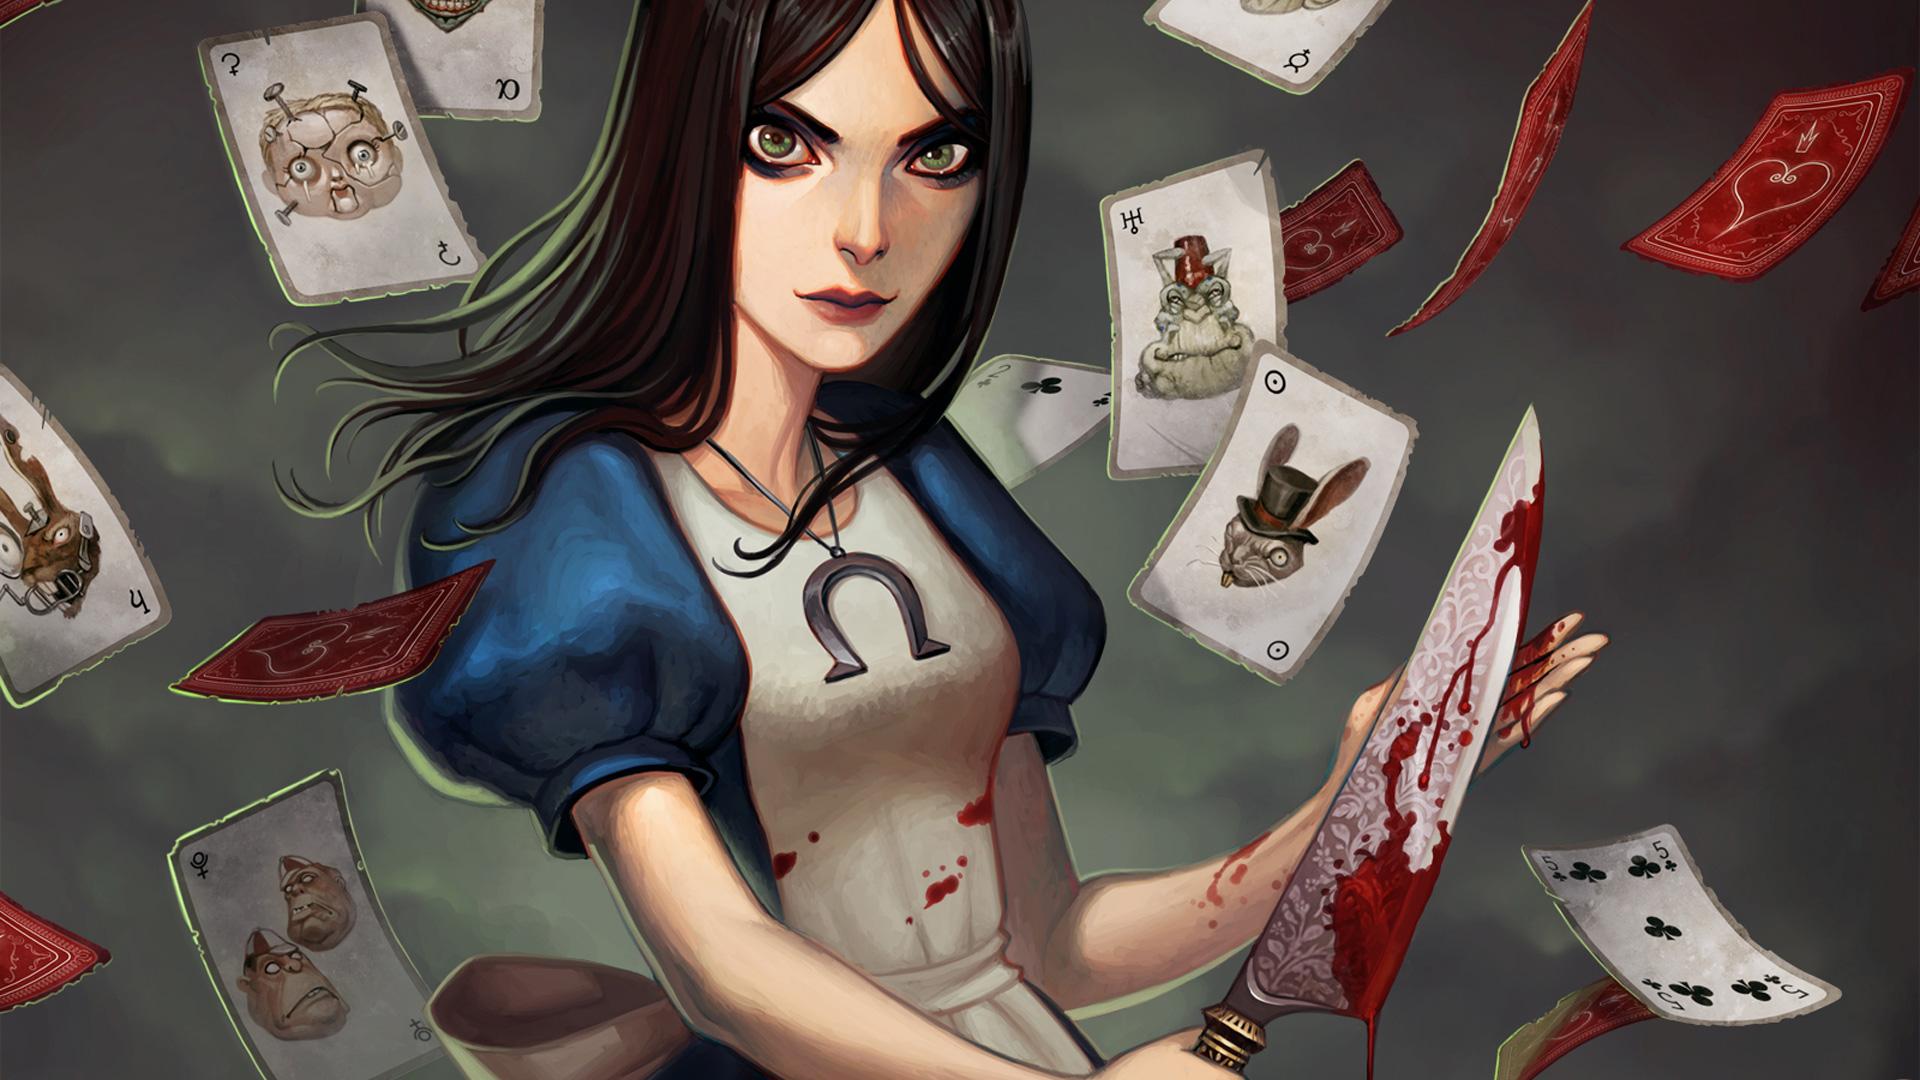 Free Alice: Madness Returns Wallpaper in 1920x1080